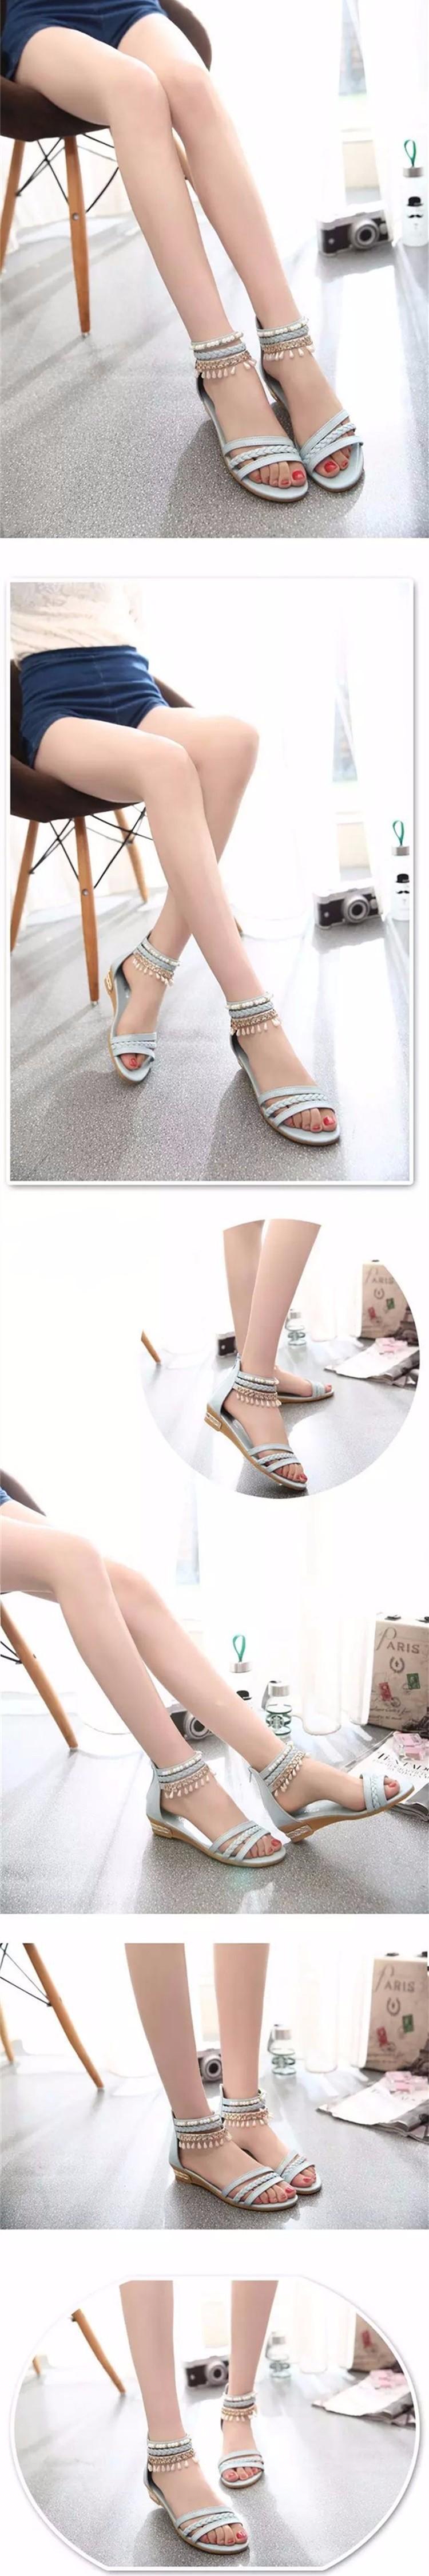 Hot Sale 2016 Summer Sweet Fashion Roman Beads Woman Sandals Leisure Peep Toe Wedges Shoes Wild Comfortable Ladies Sandals DT141 (7)